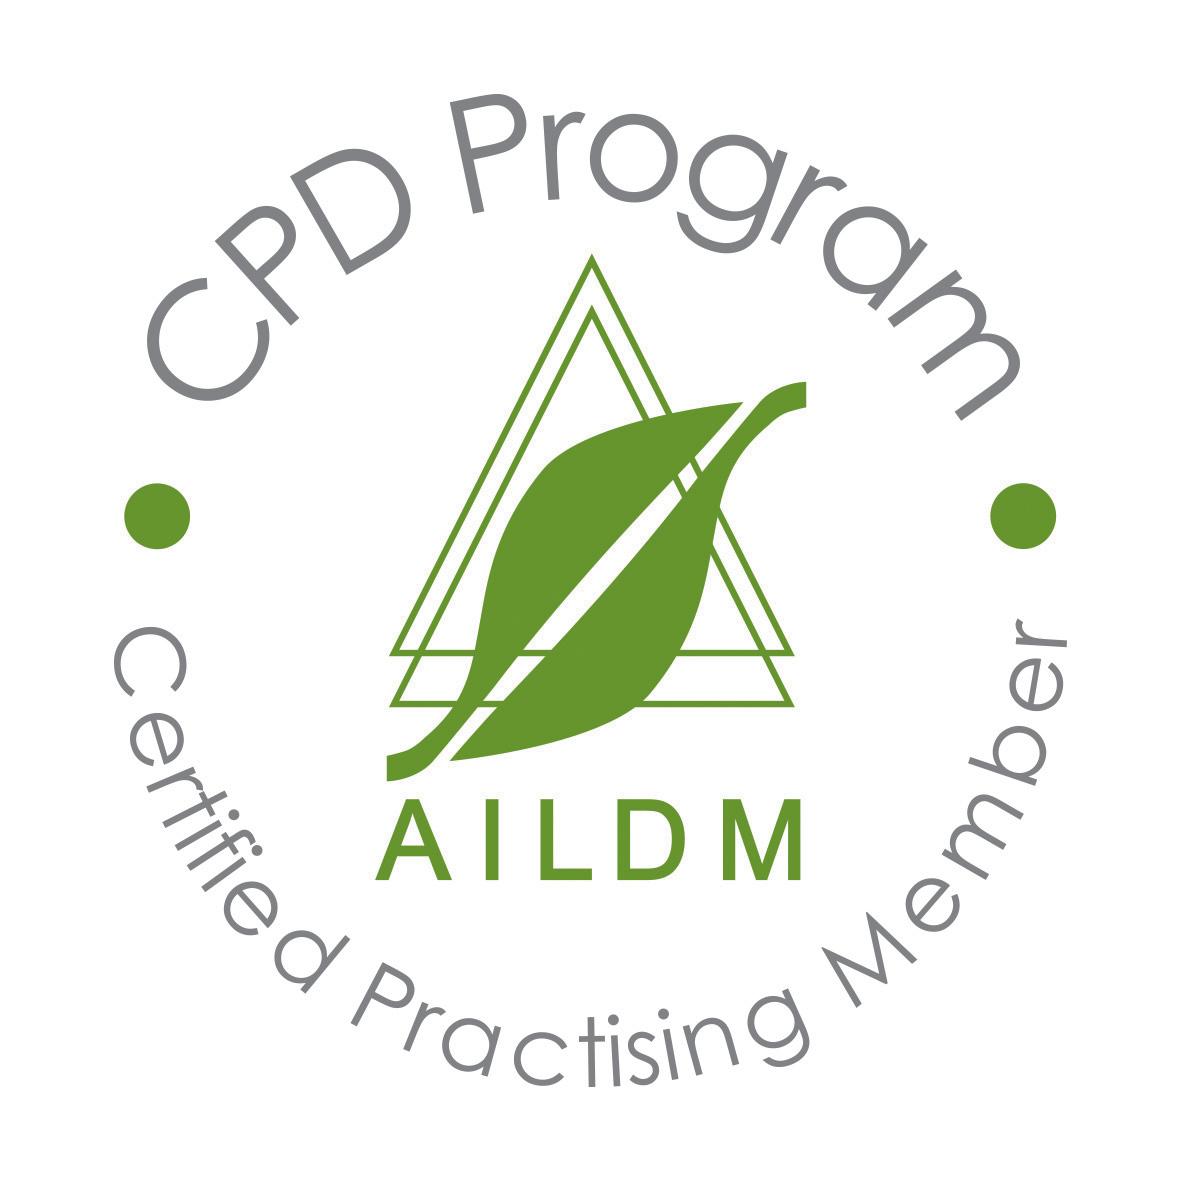 AILDM Logo Colour RGB.jpg